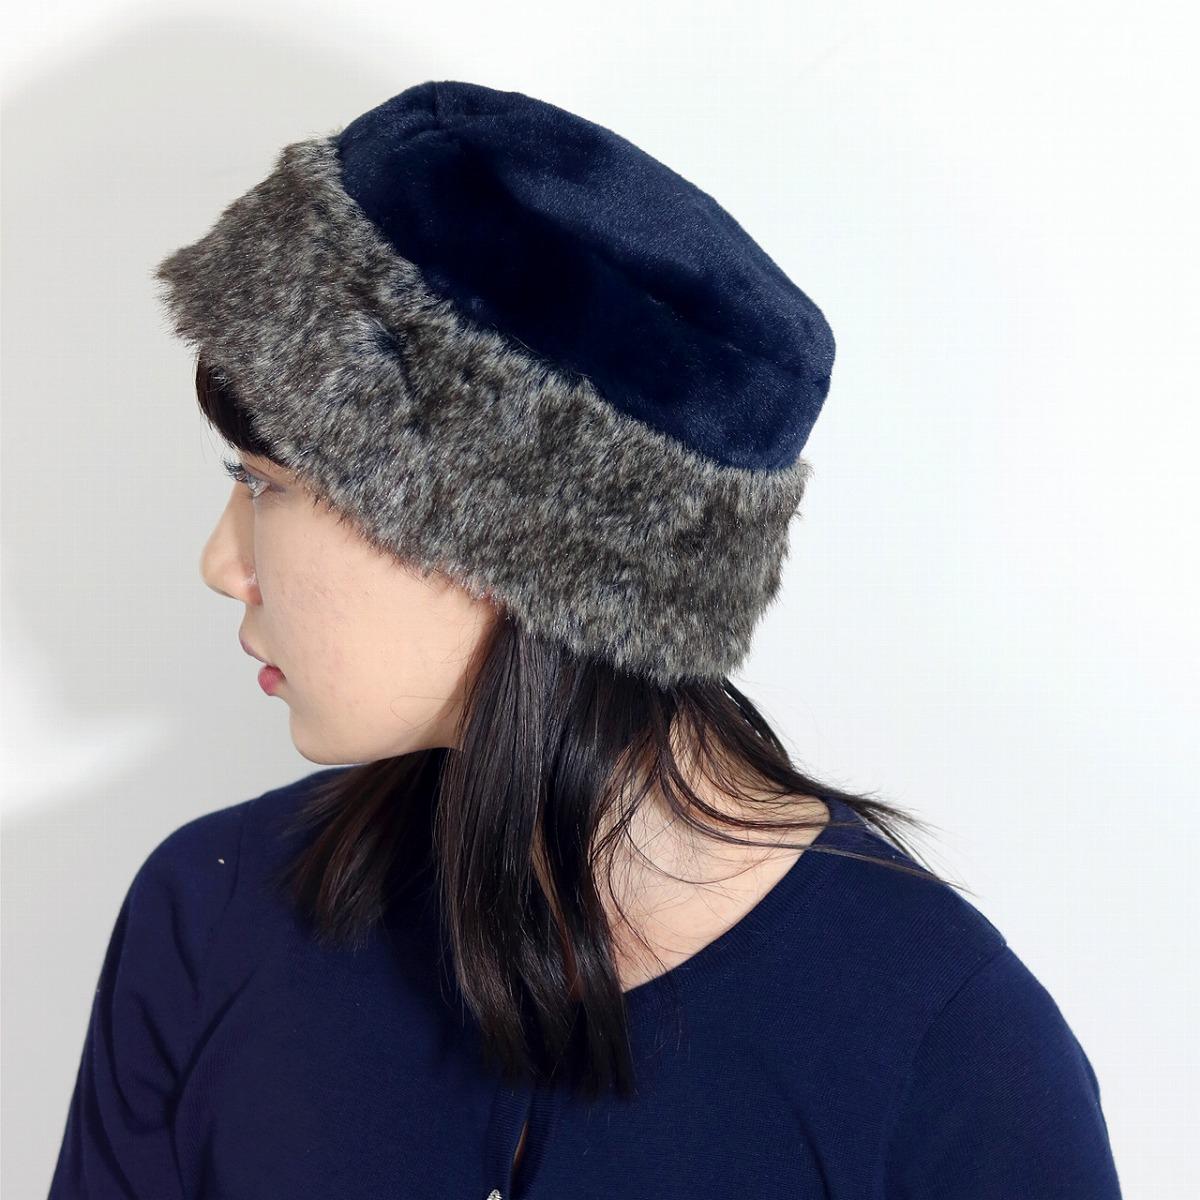 018672d2e0a081 ... Hat Rouben Russian hat men gap Dis hat dark blue navy with the RUBEN Russia  hat ...